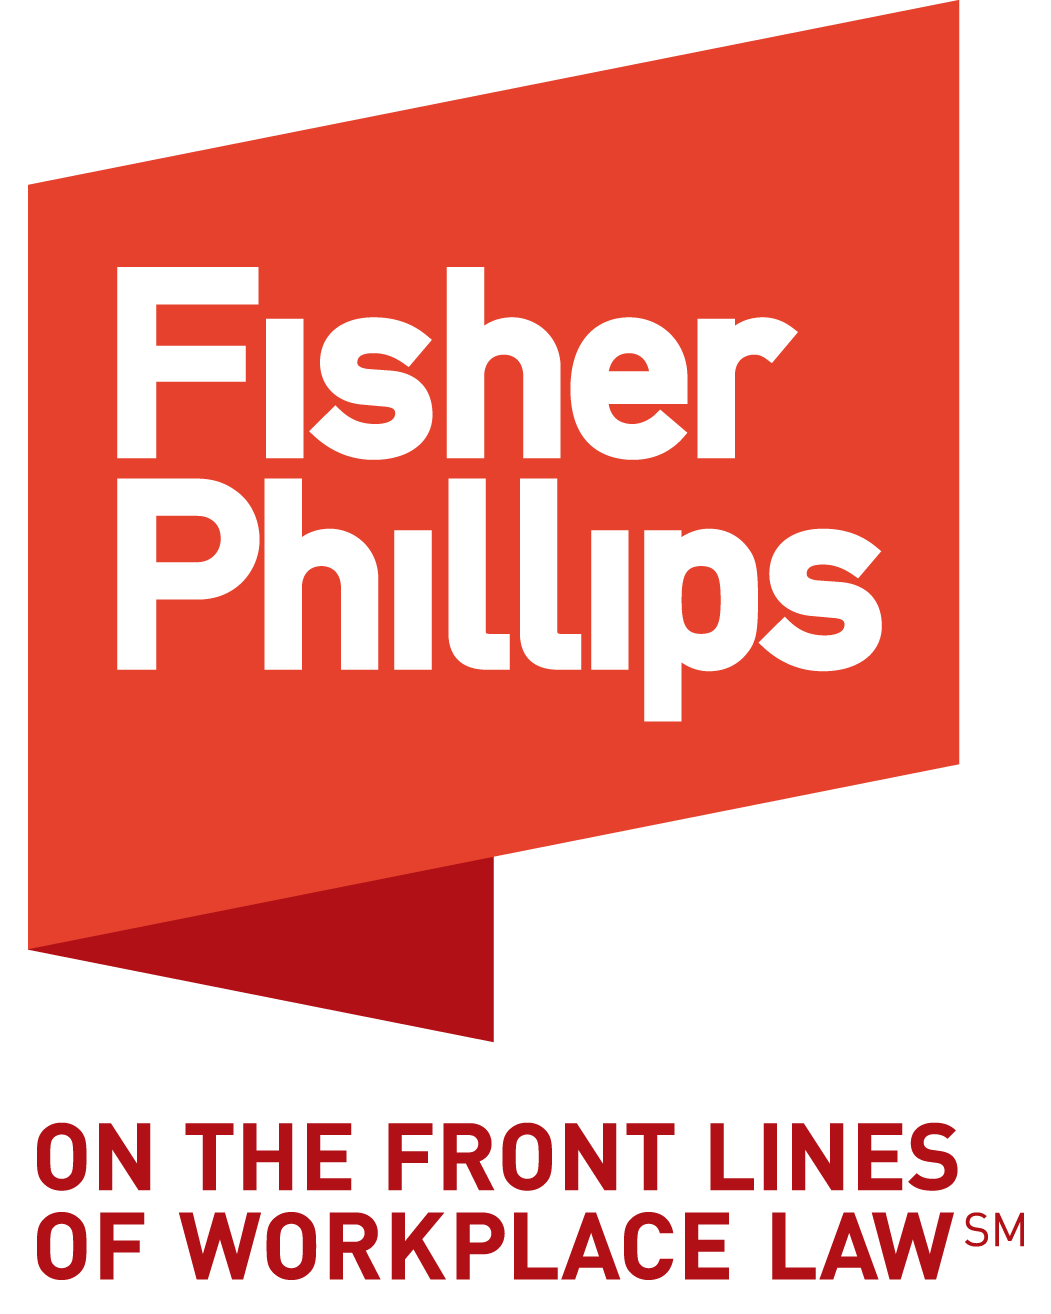 FisherPhillips_LogoTagline